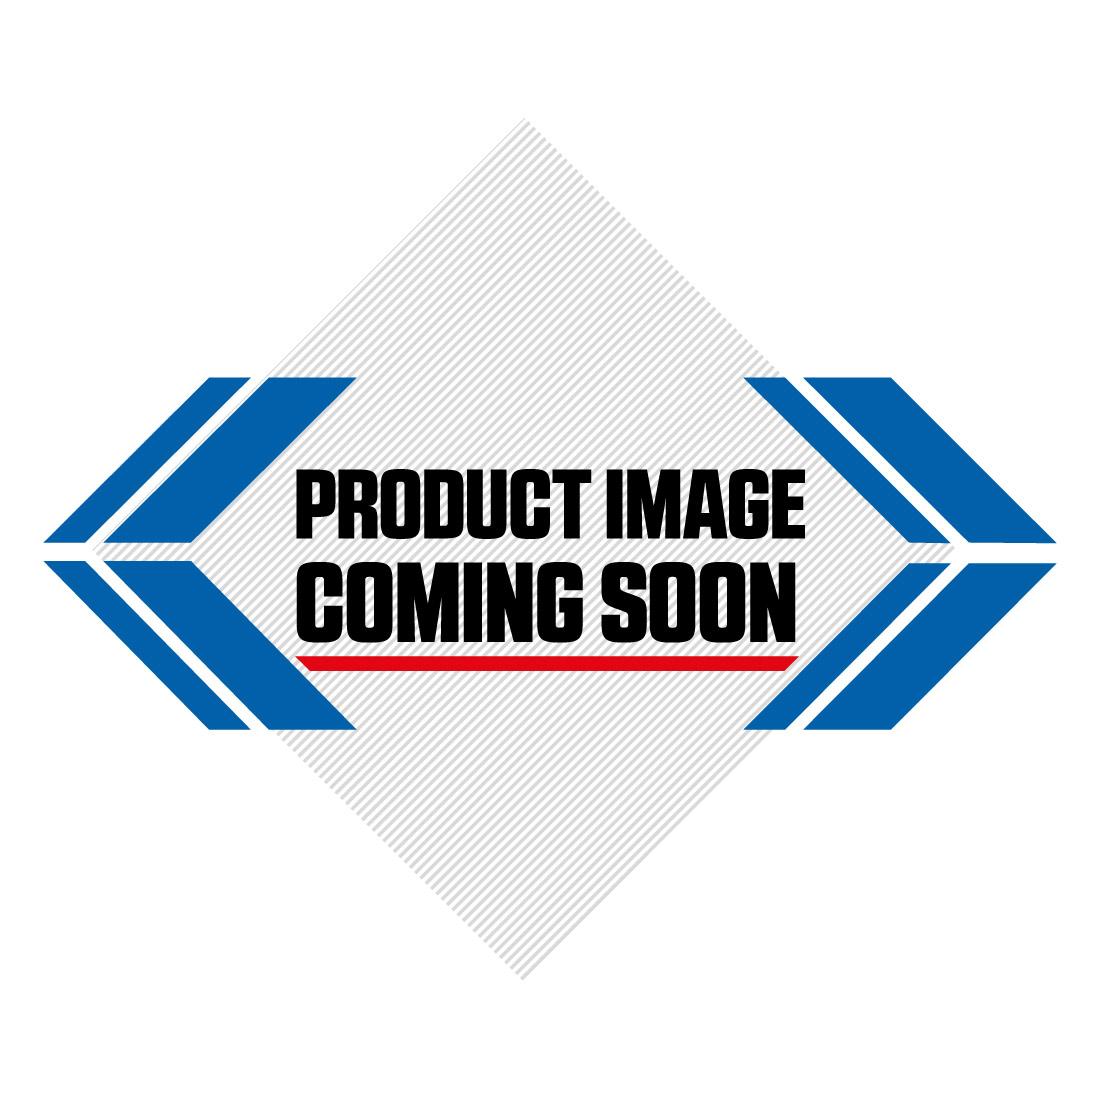 Kawasaki Restyled Plastic Kit KX 85 (01-09) (11-12) OEM Factory Image-5>